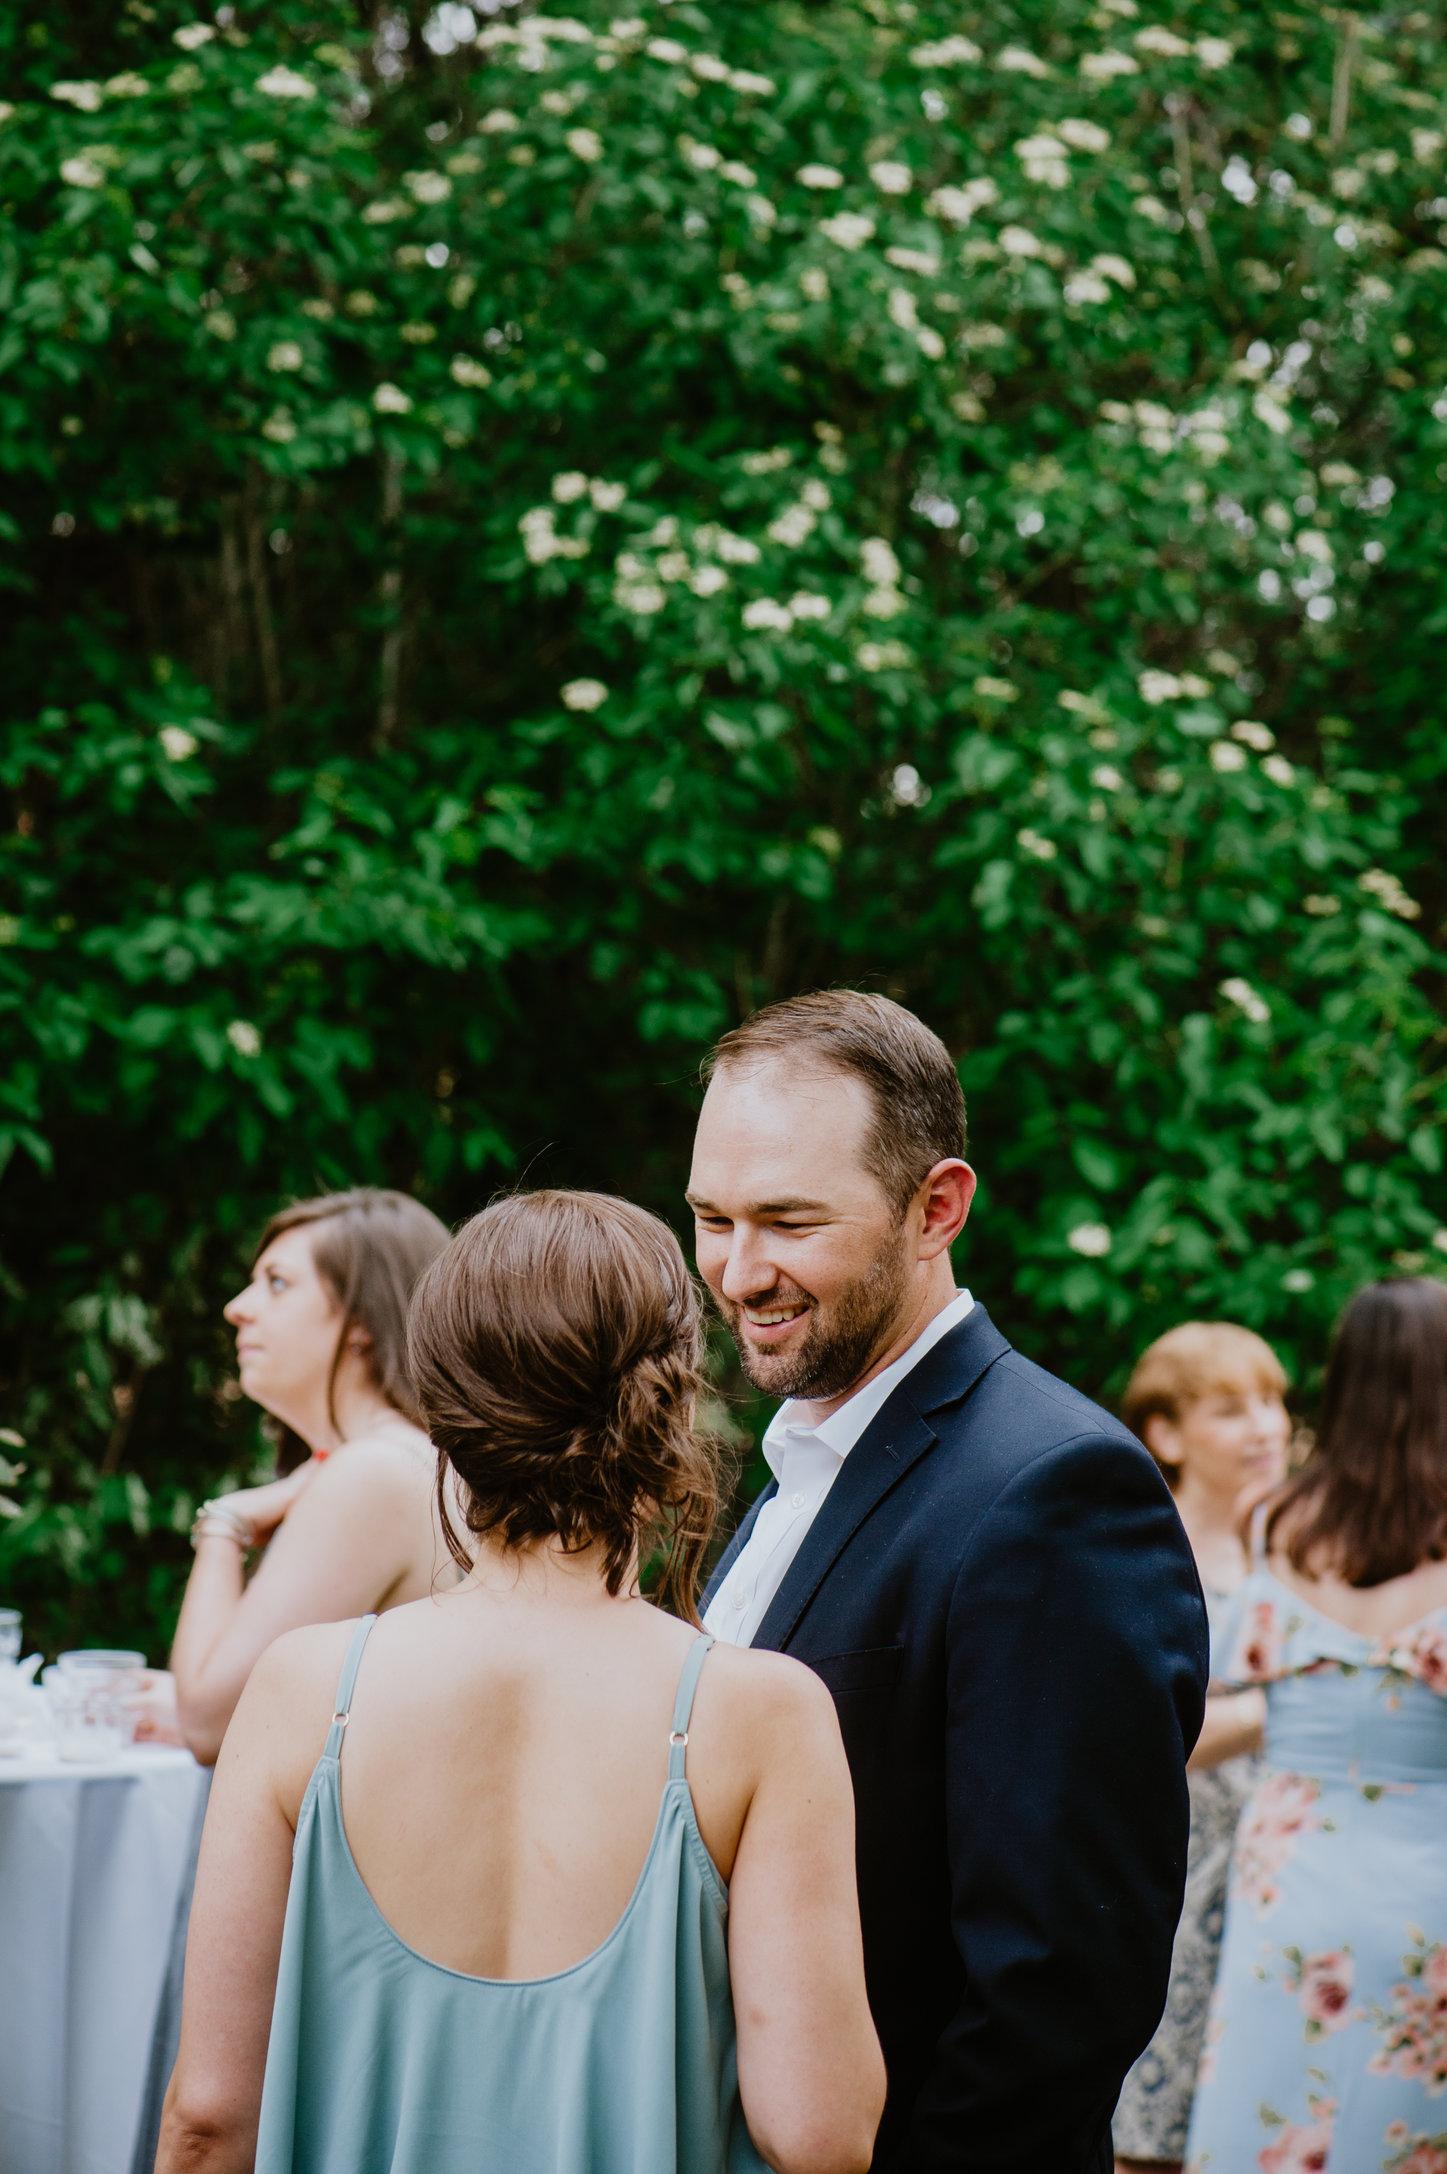 DandA-wedding-359.jpg